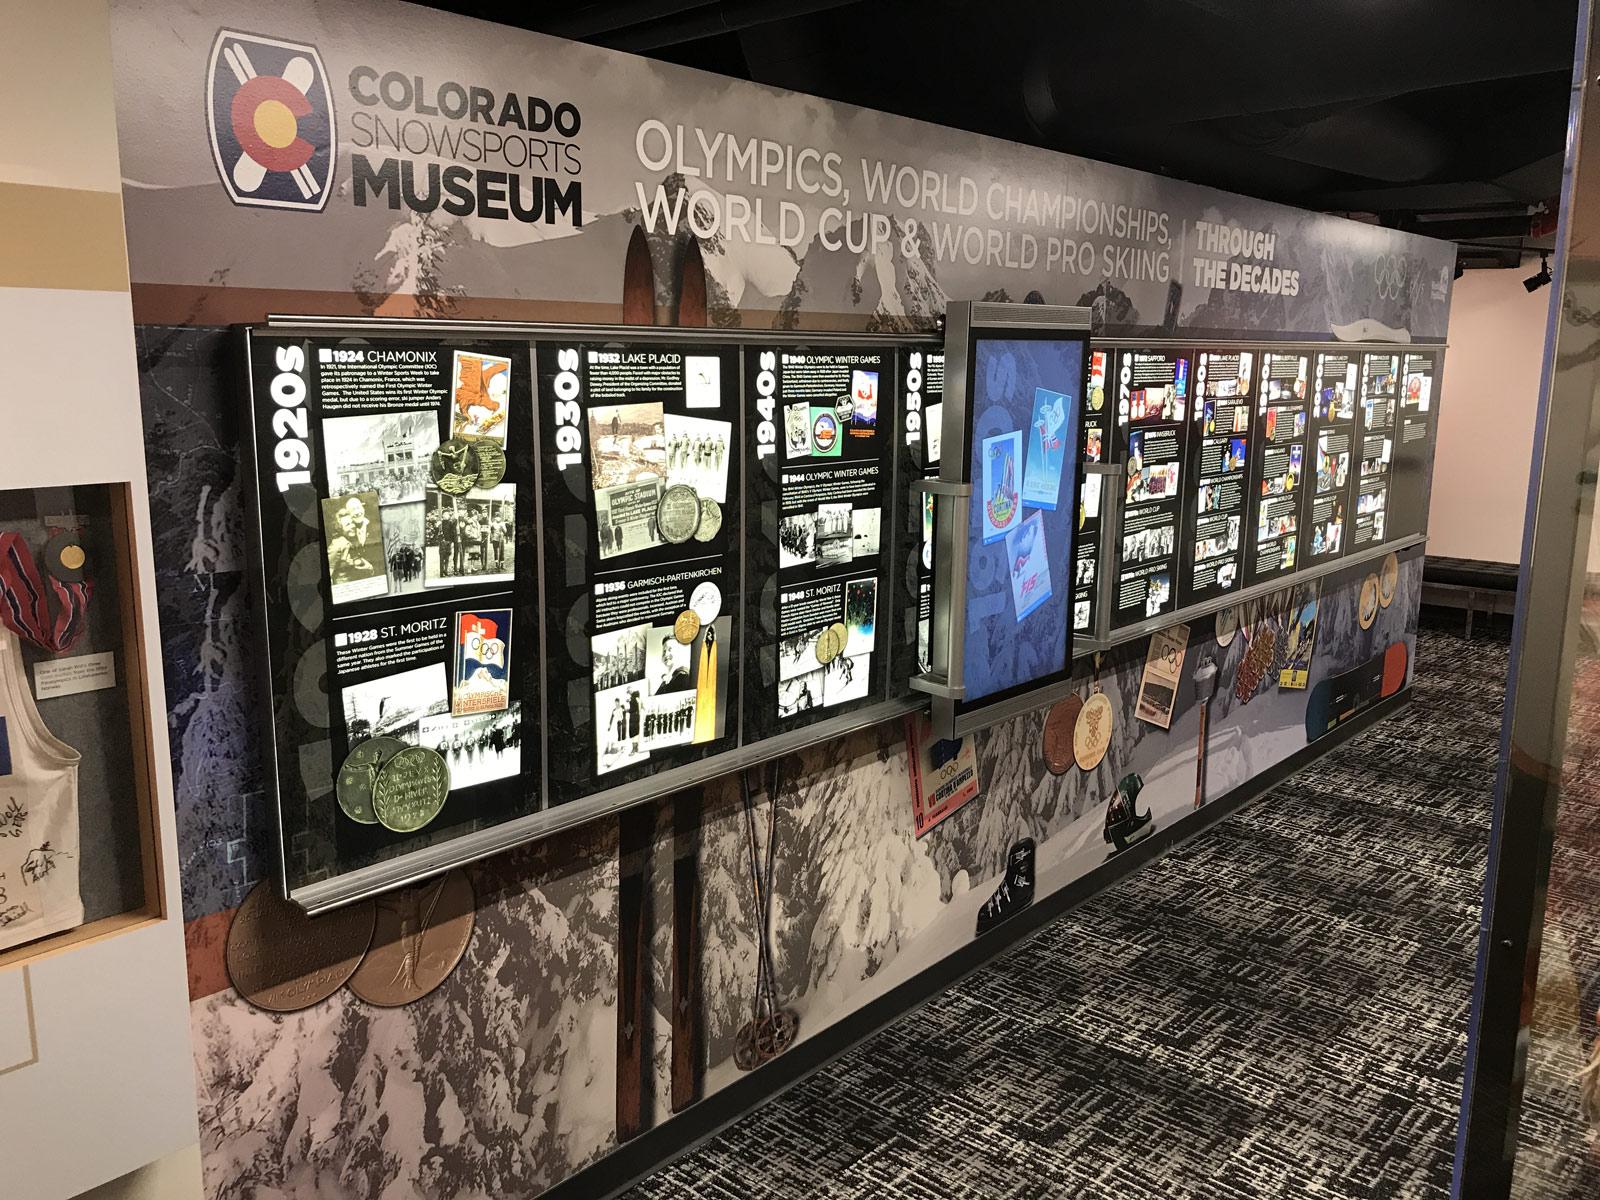 Colorado Snowsports Museum